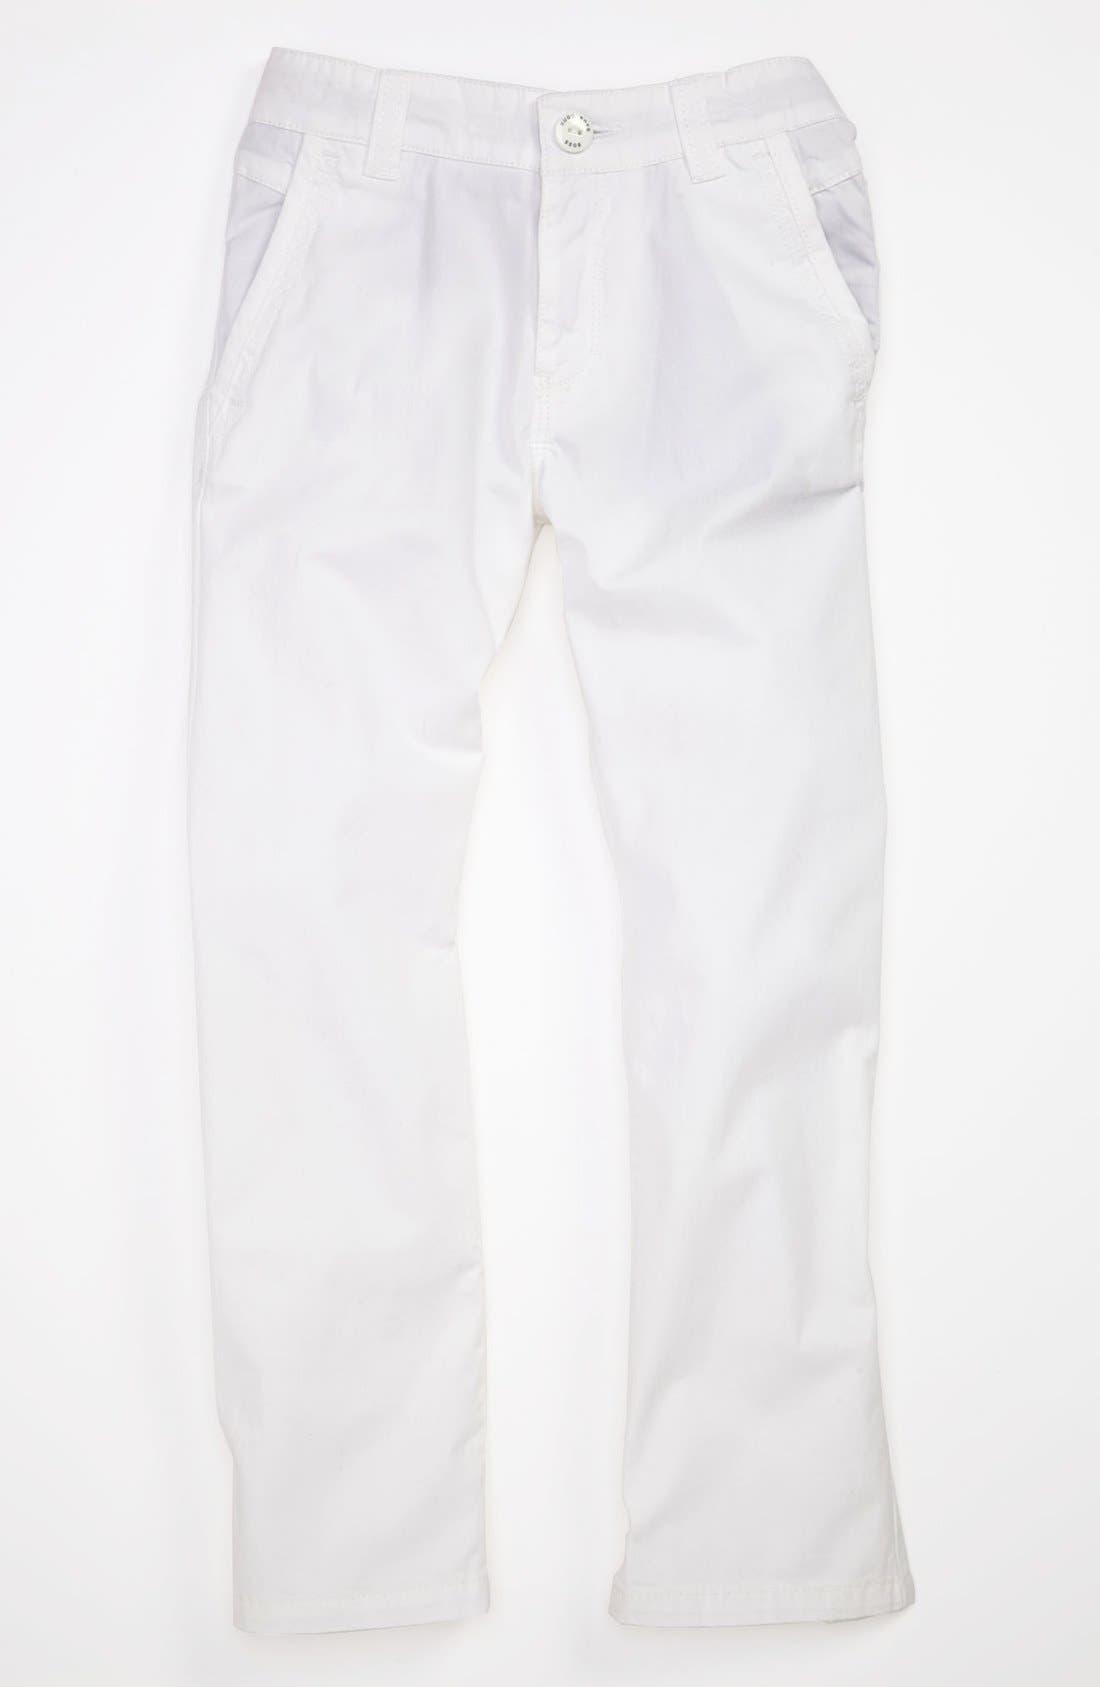 Main Image - BOSS Kidswear Twill Pants (Little Boys & Big Boys)